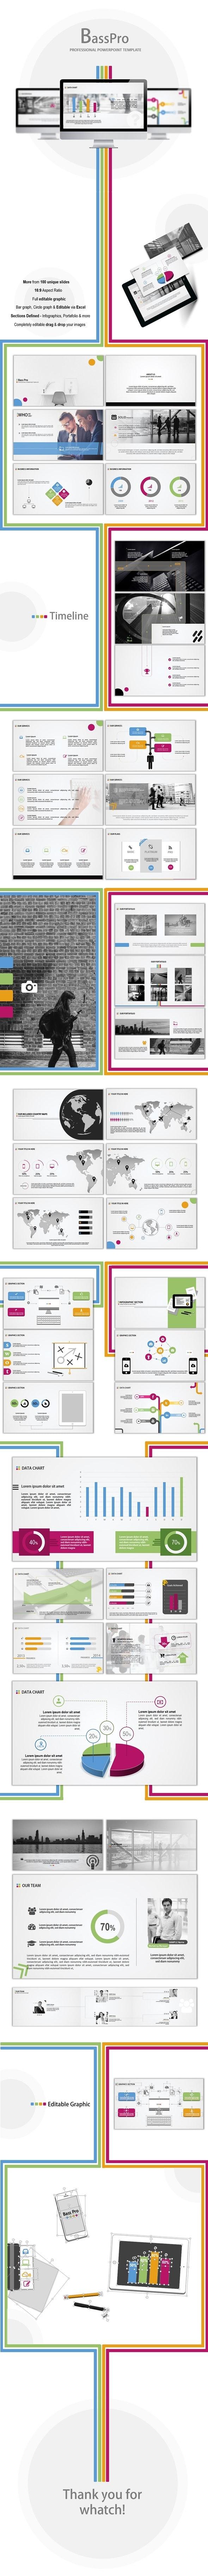 Bass Pro - Powerpoint Presentation - Presentation Templates